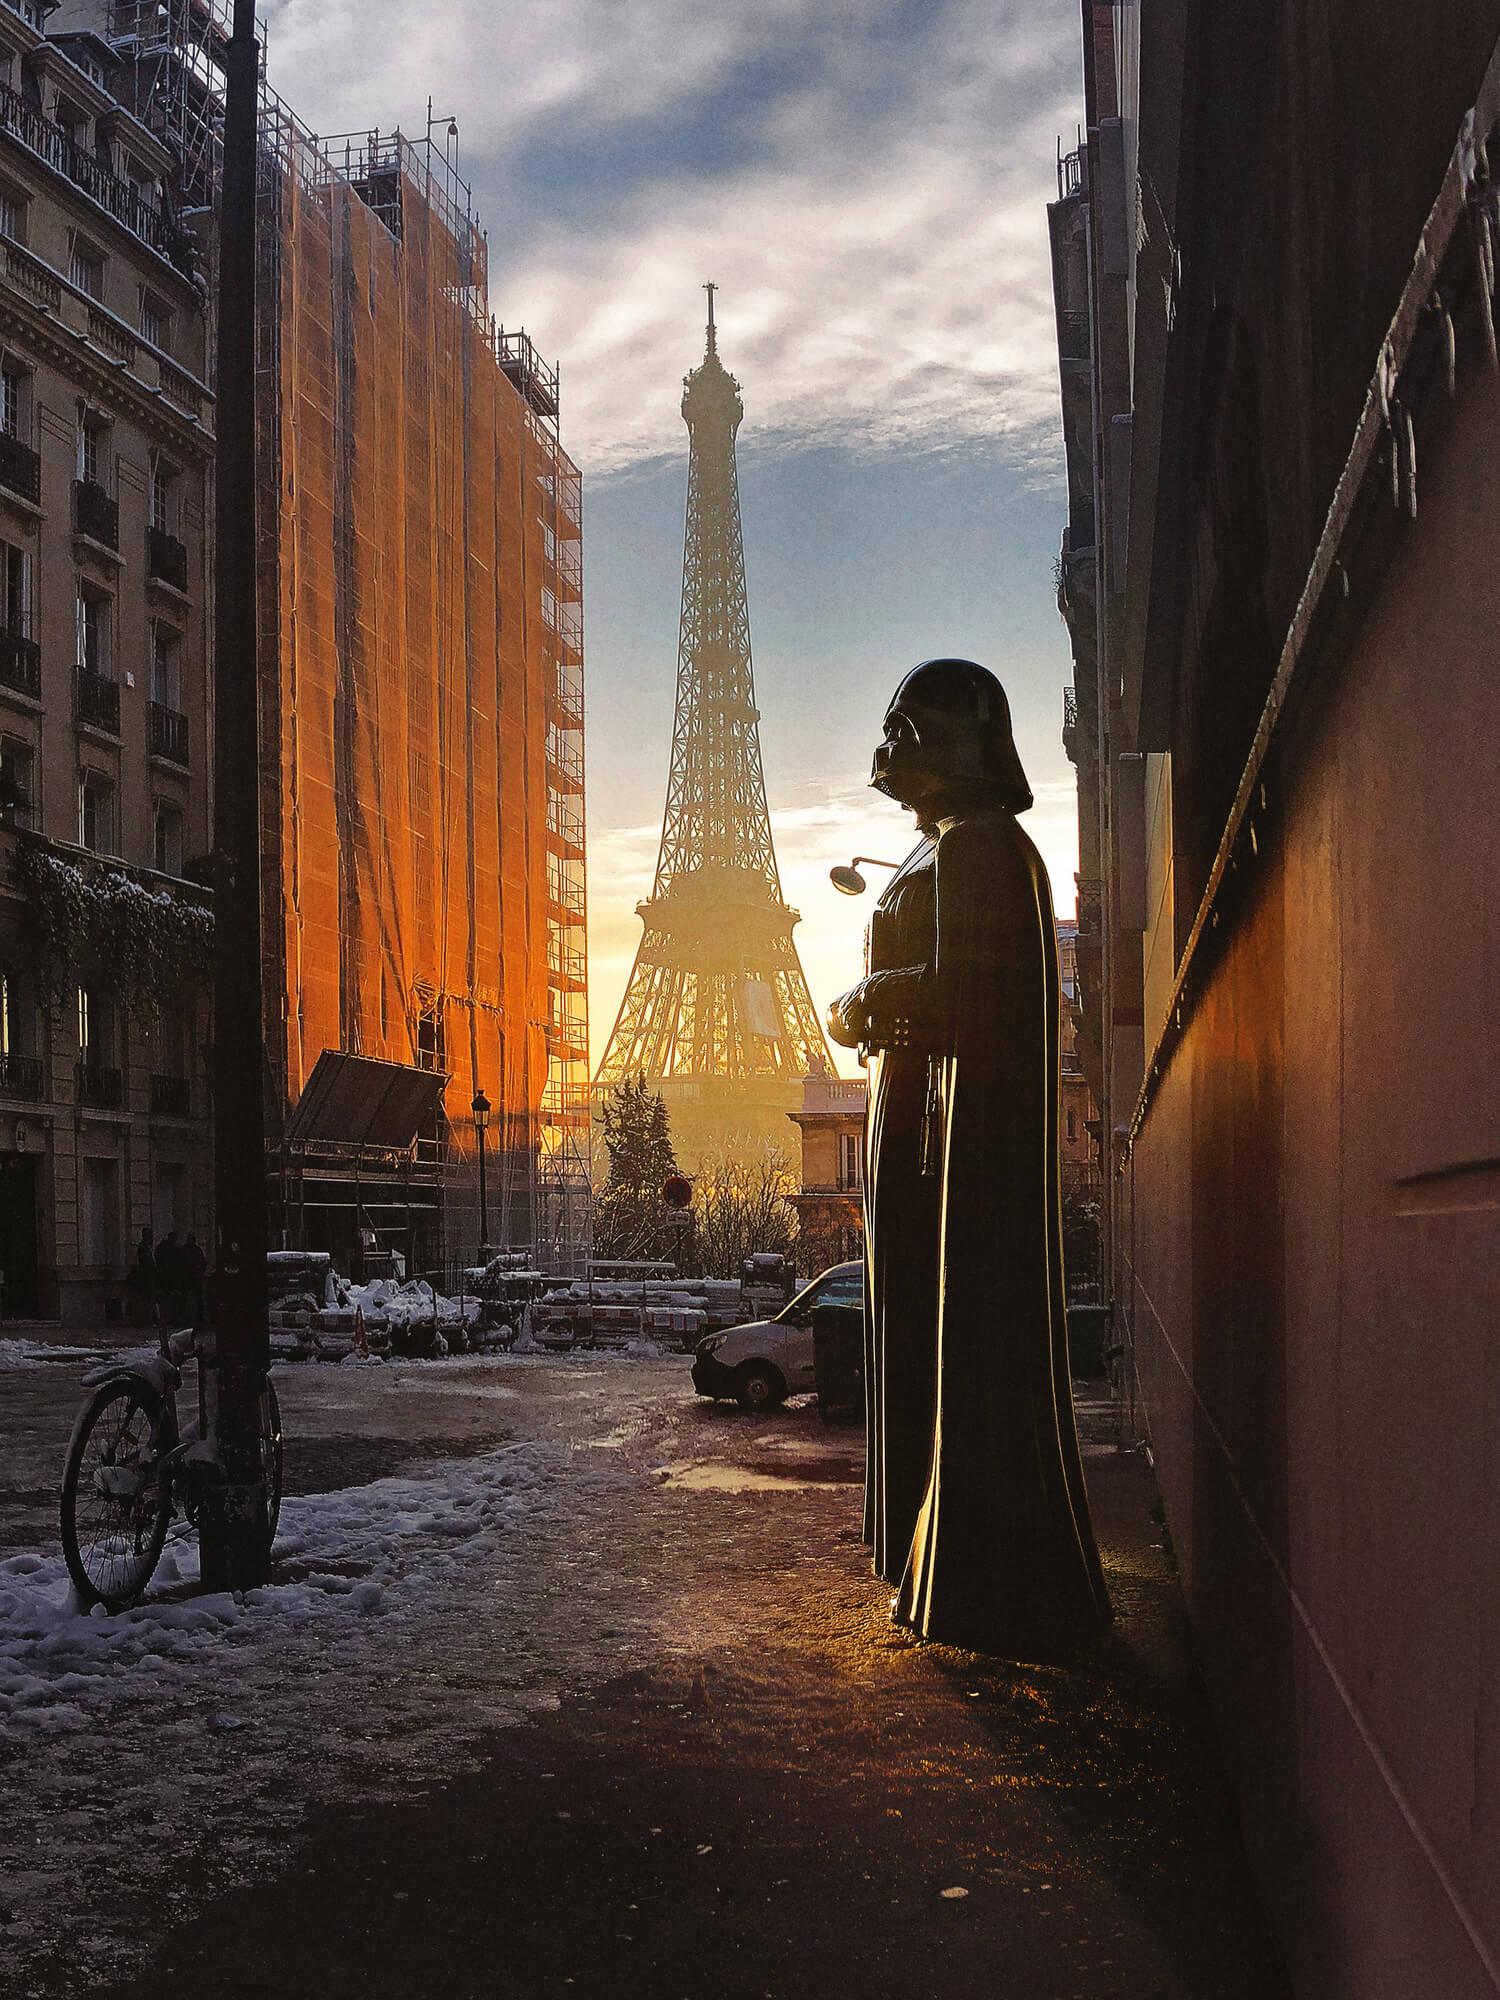 Escena Star Wars París Darth Vader torre Eiffel